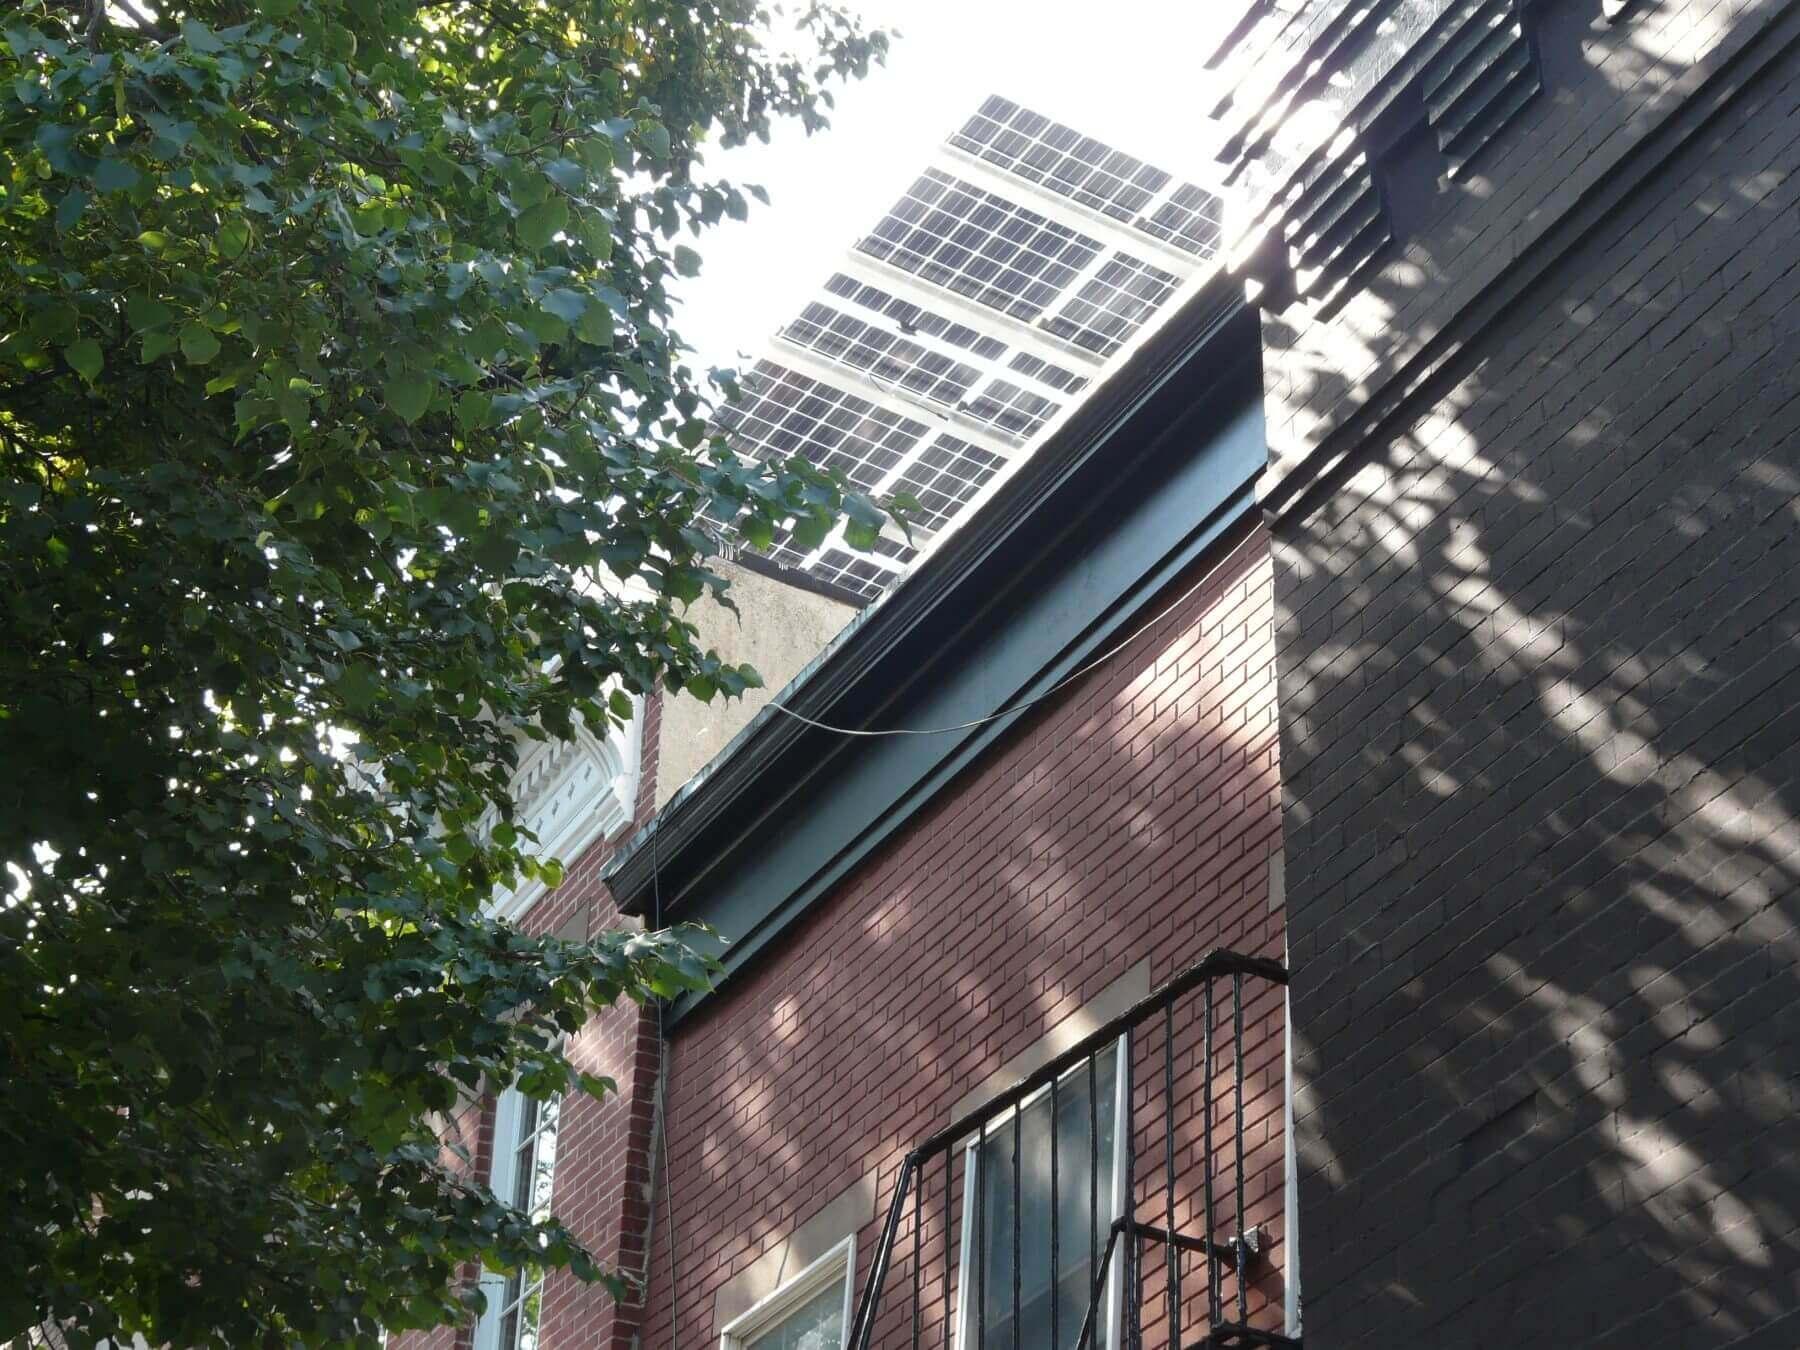 solar canopy street view